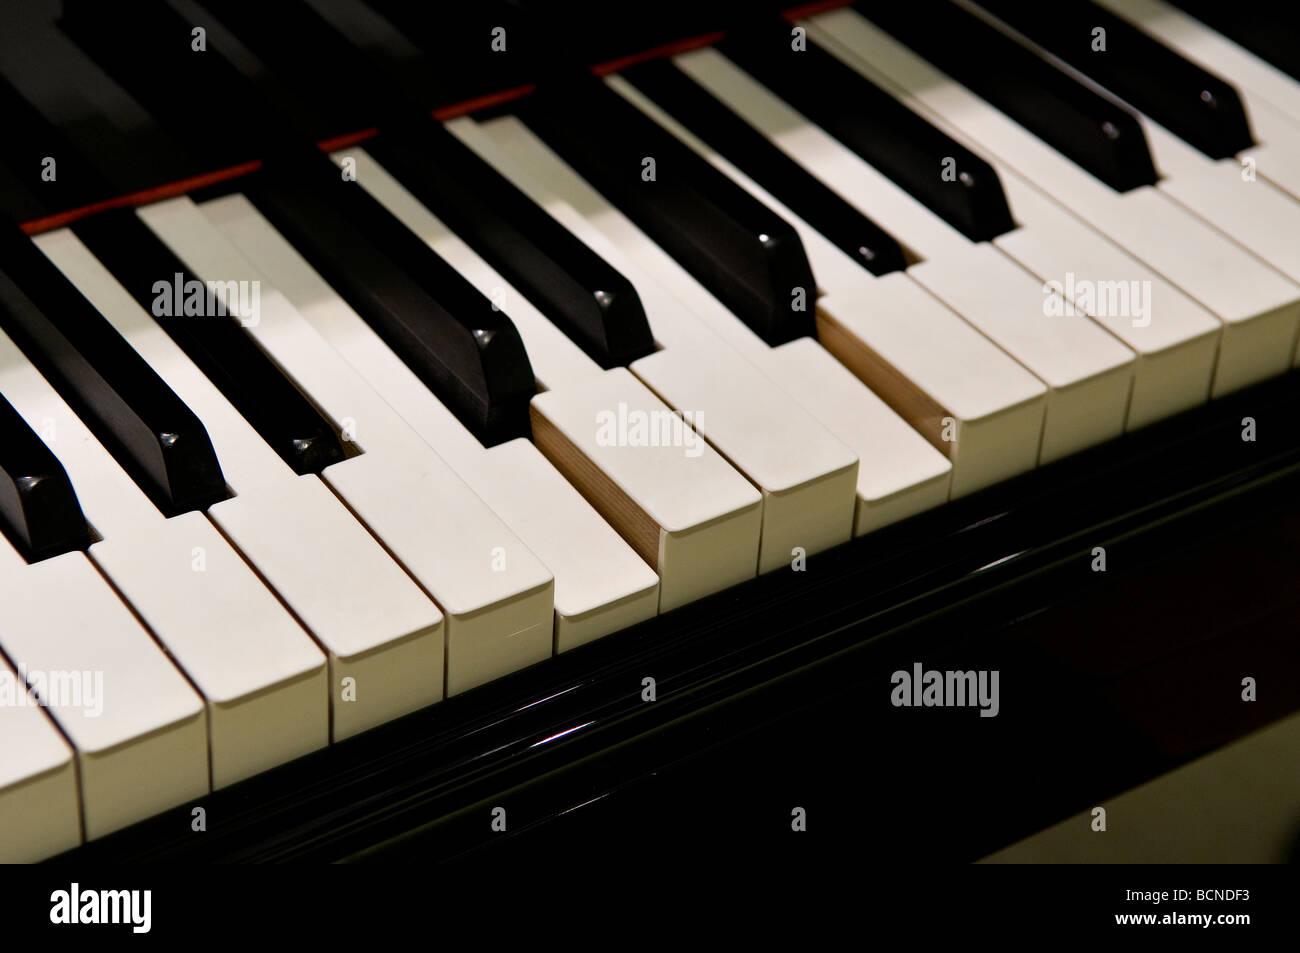 Pressed piano keyboard - Stock Image